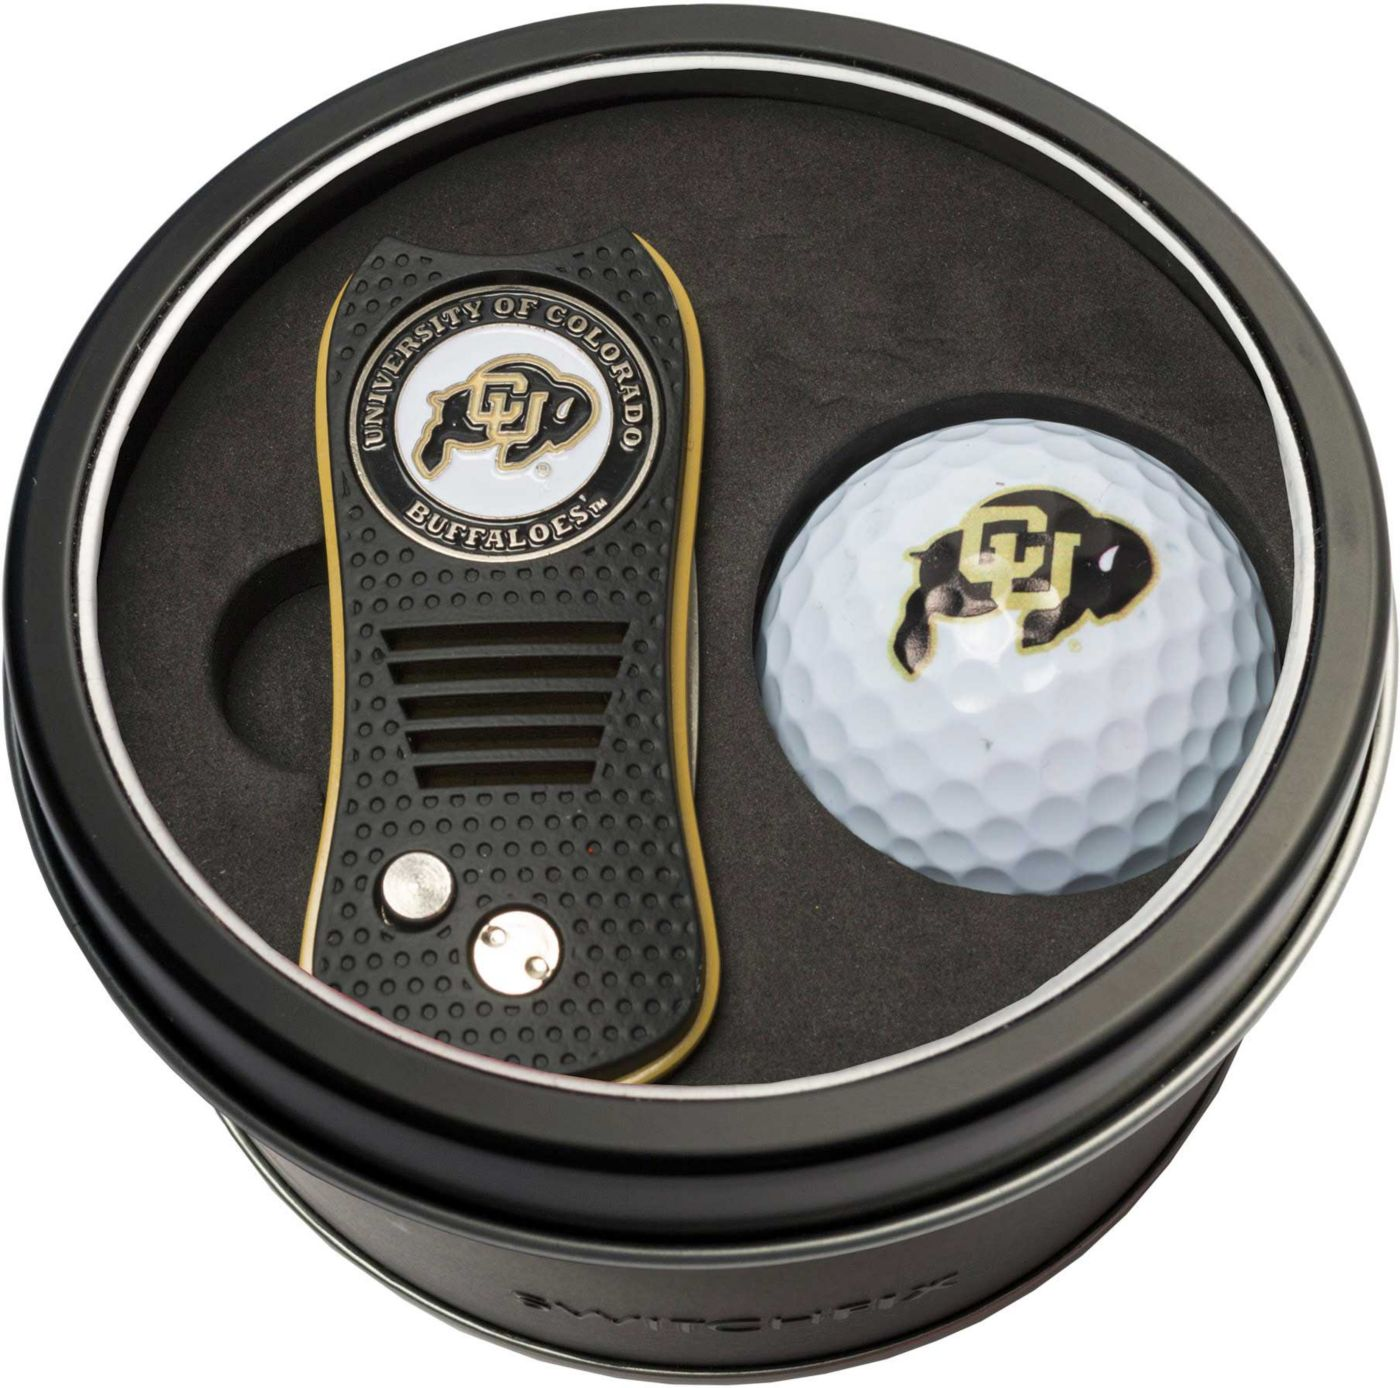 Team Golf Colorado Buffaloes Switchfix Divot Tool and Golf Ball Set